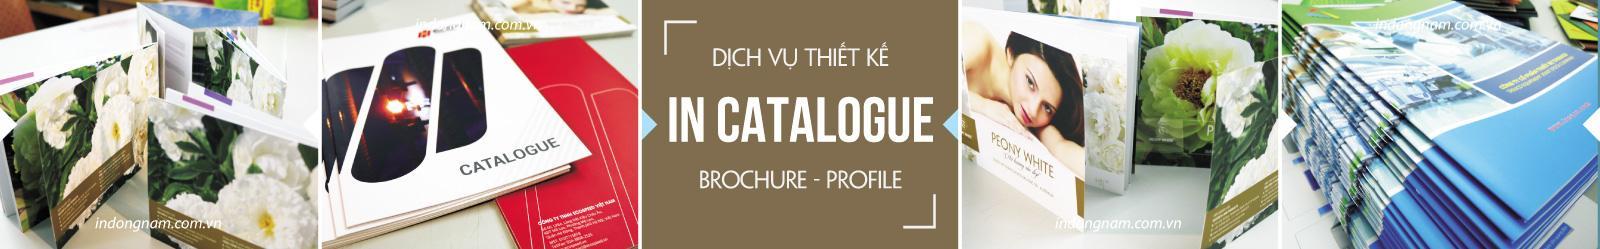 thiết kế catalogue brochure